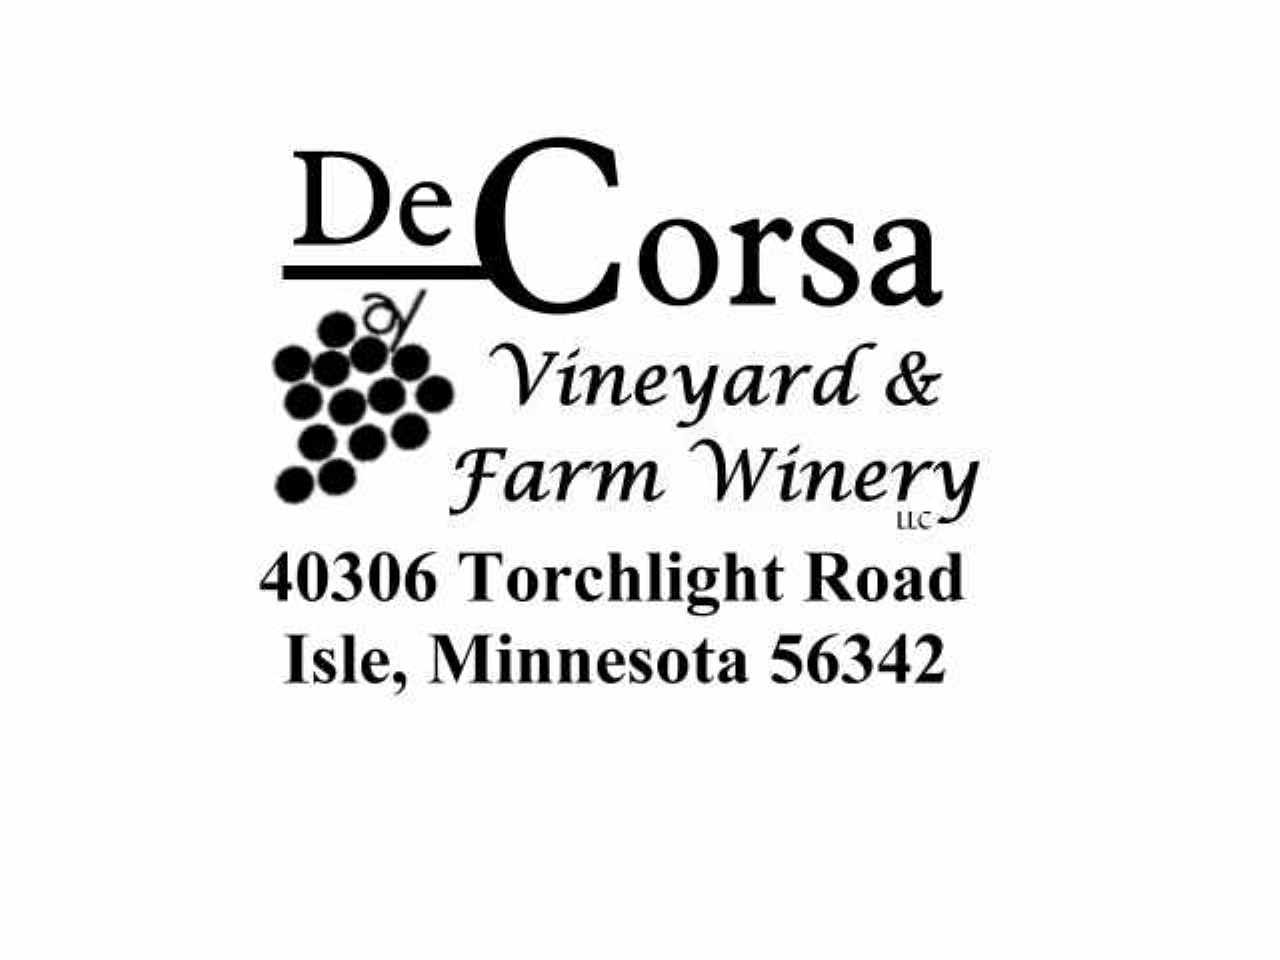 DeCorsa Vineyard and Farm Winery